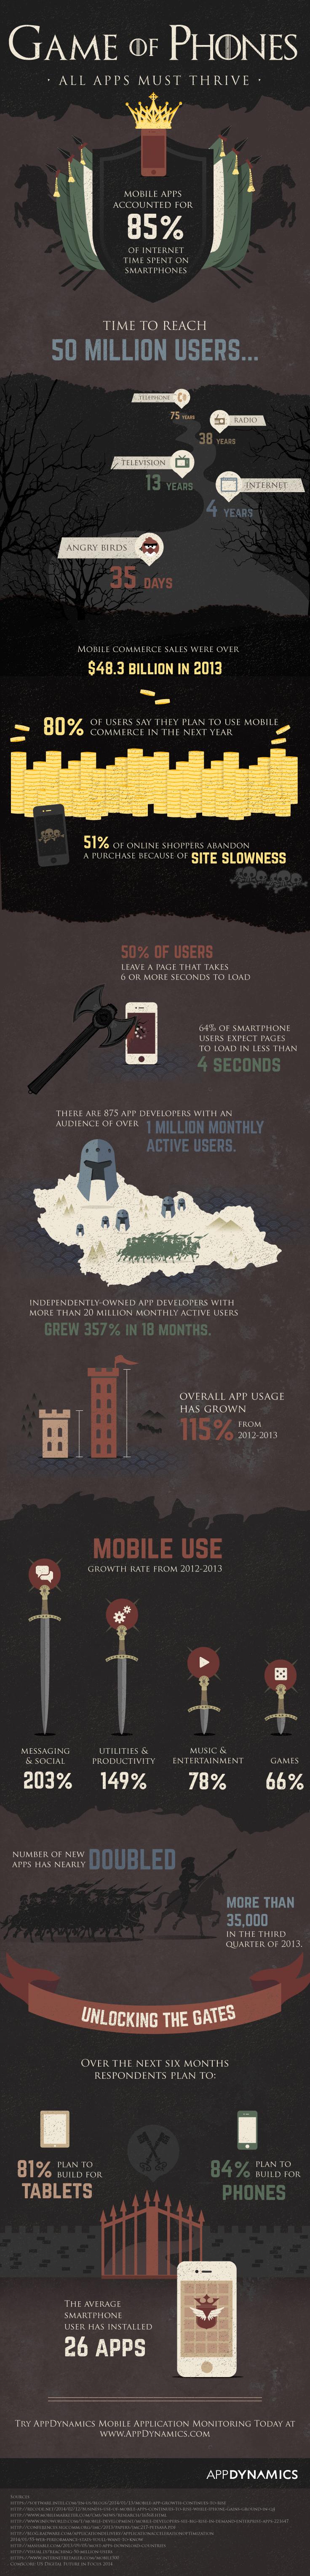 infografia-juego-tronos-apps